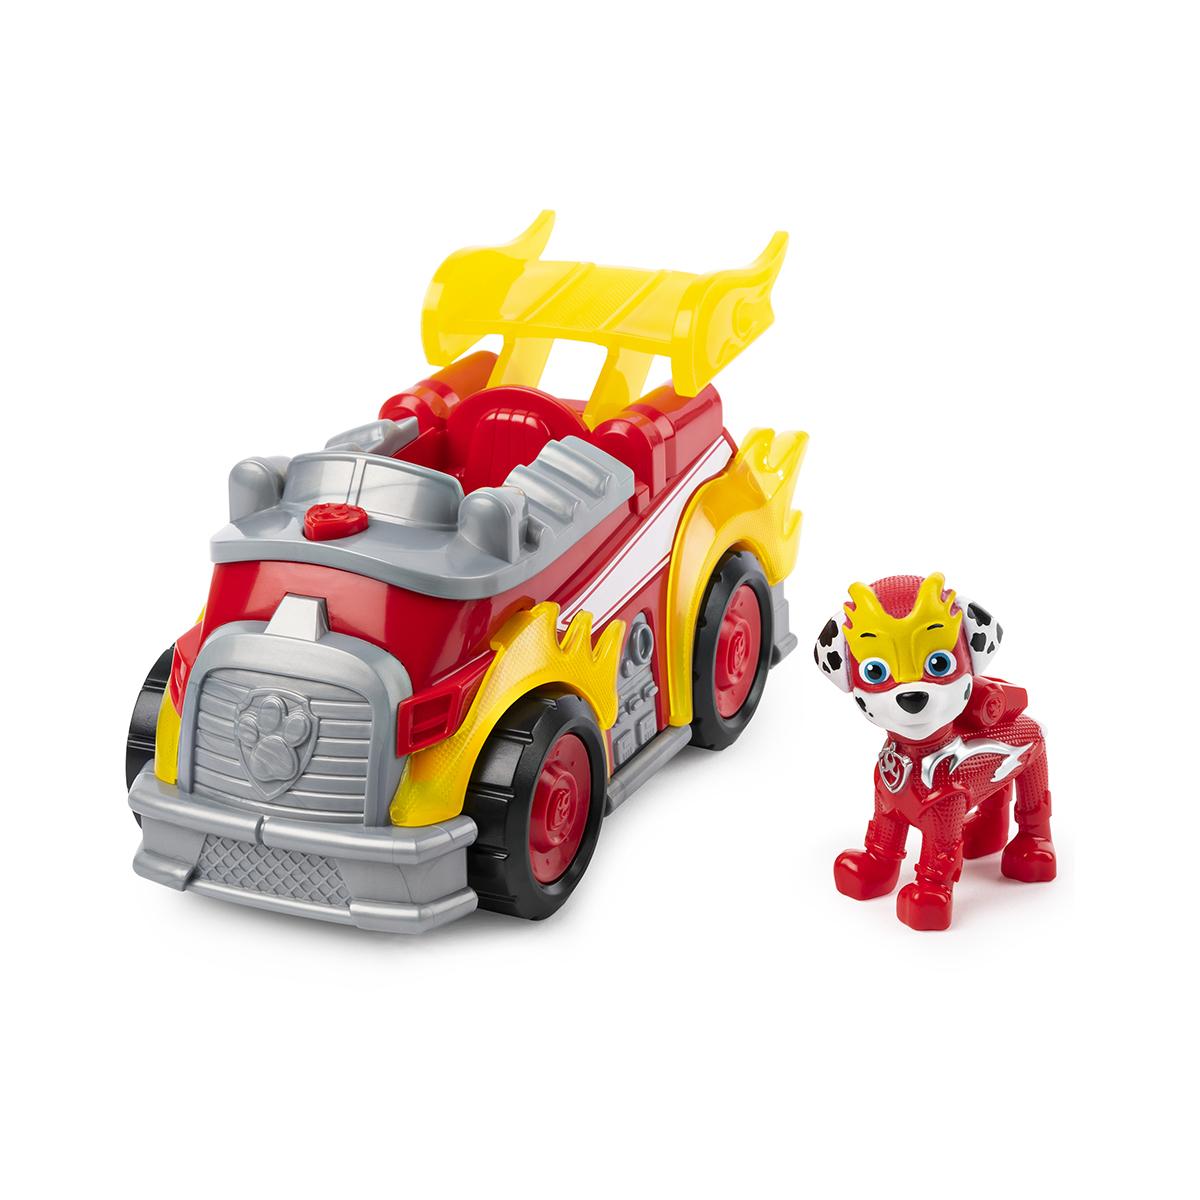 Figurina cu vehicul Paw Patrol, Marshall (20115476)